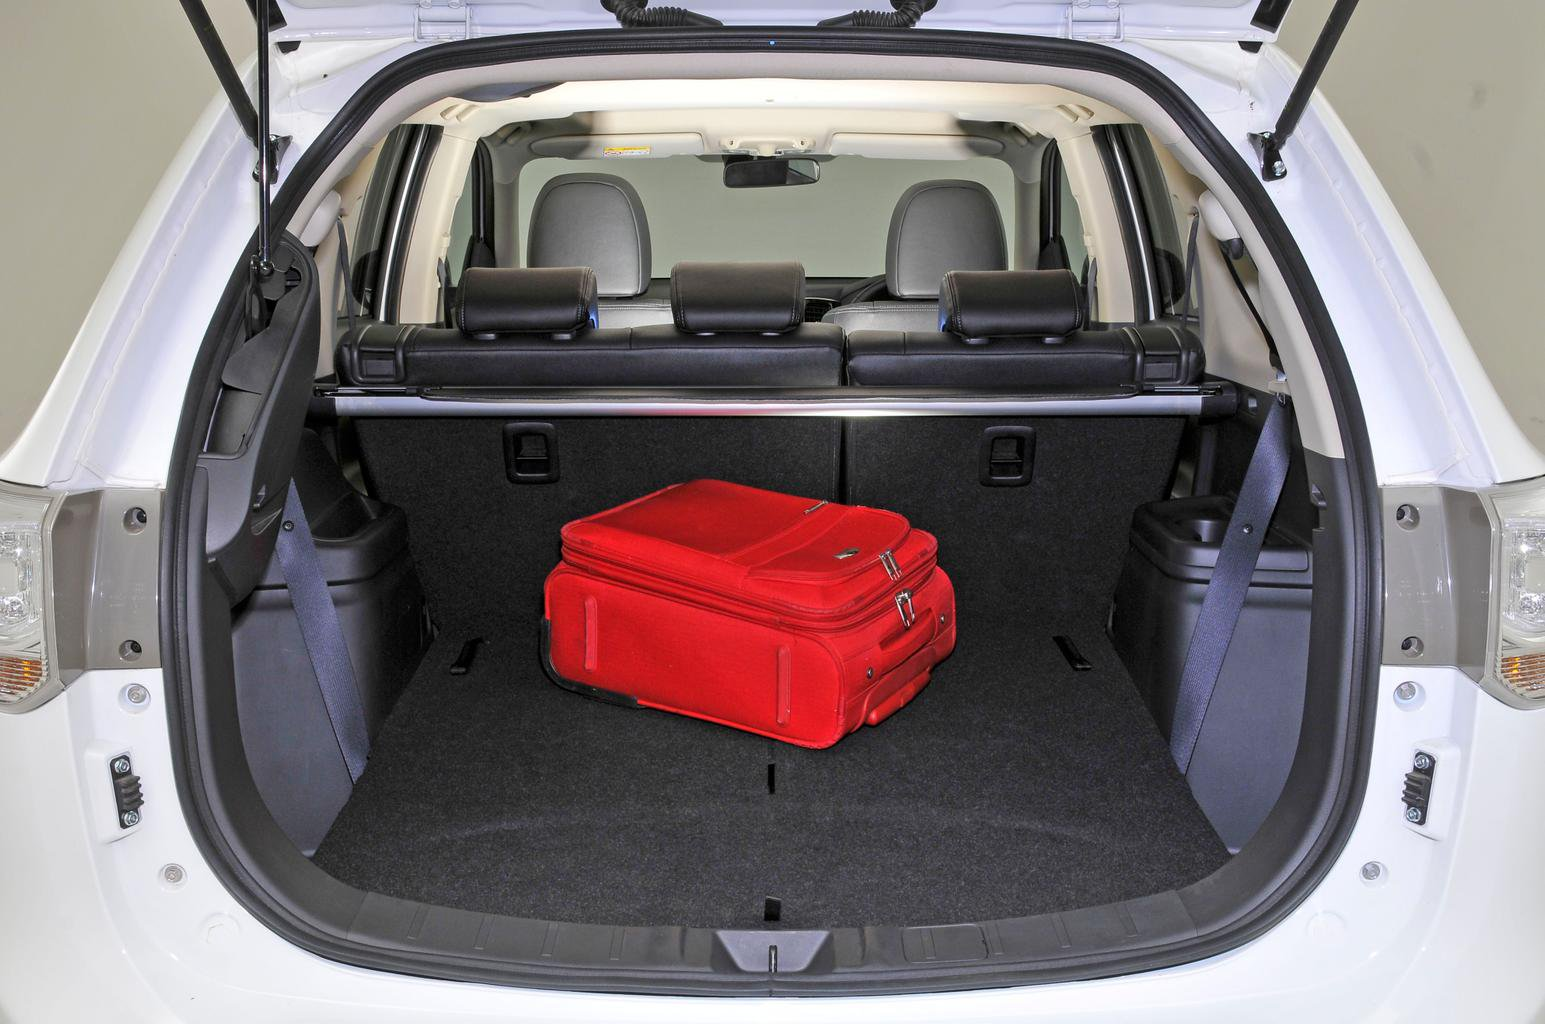 Used Mitsubishi Outlander 13-present